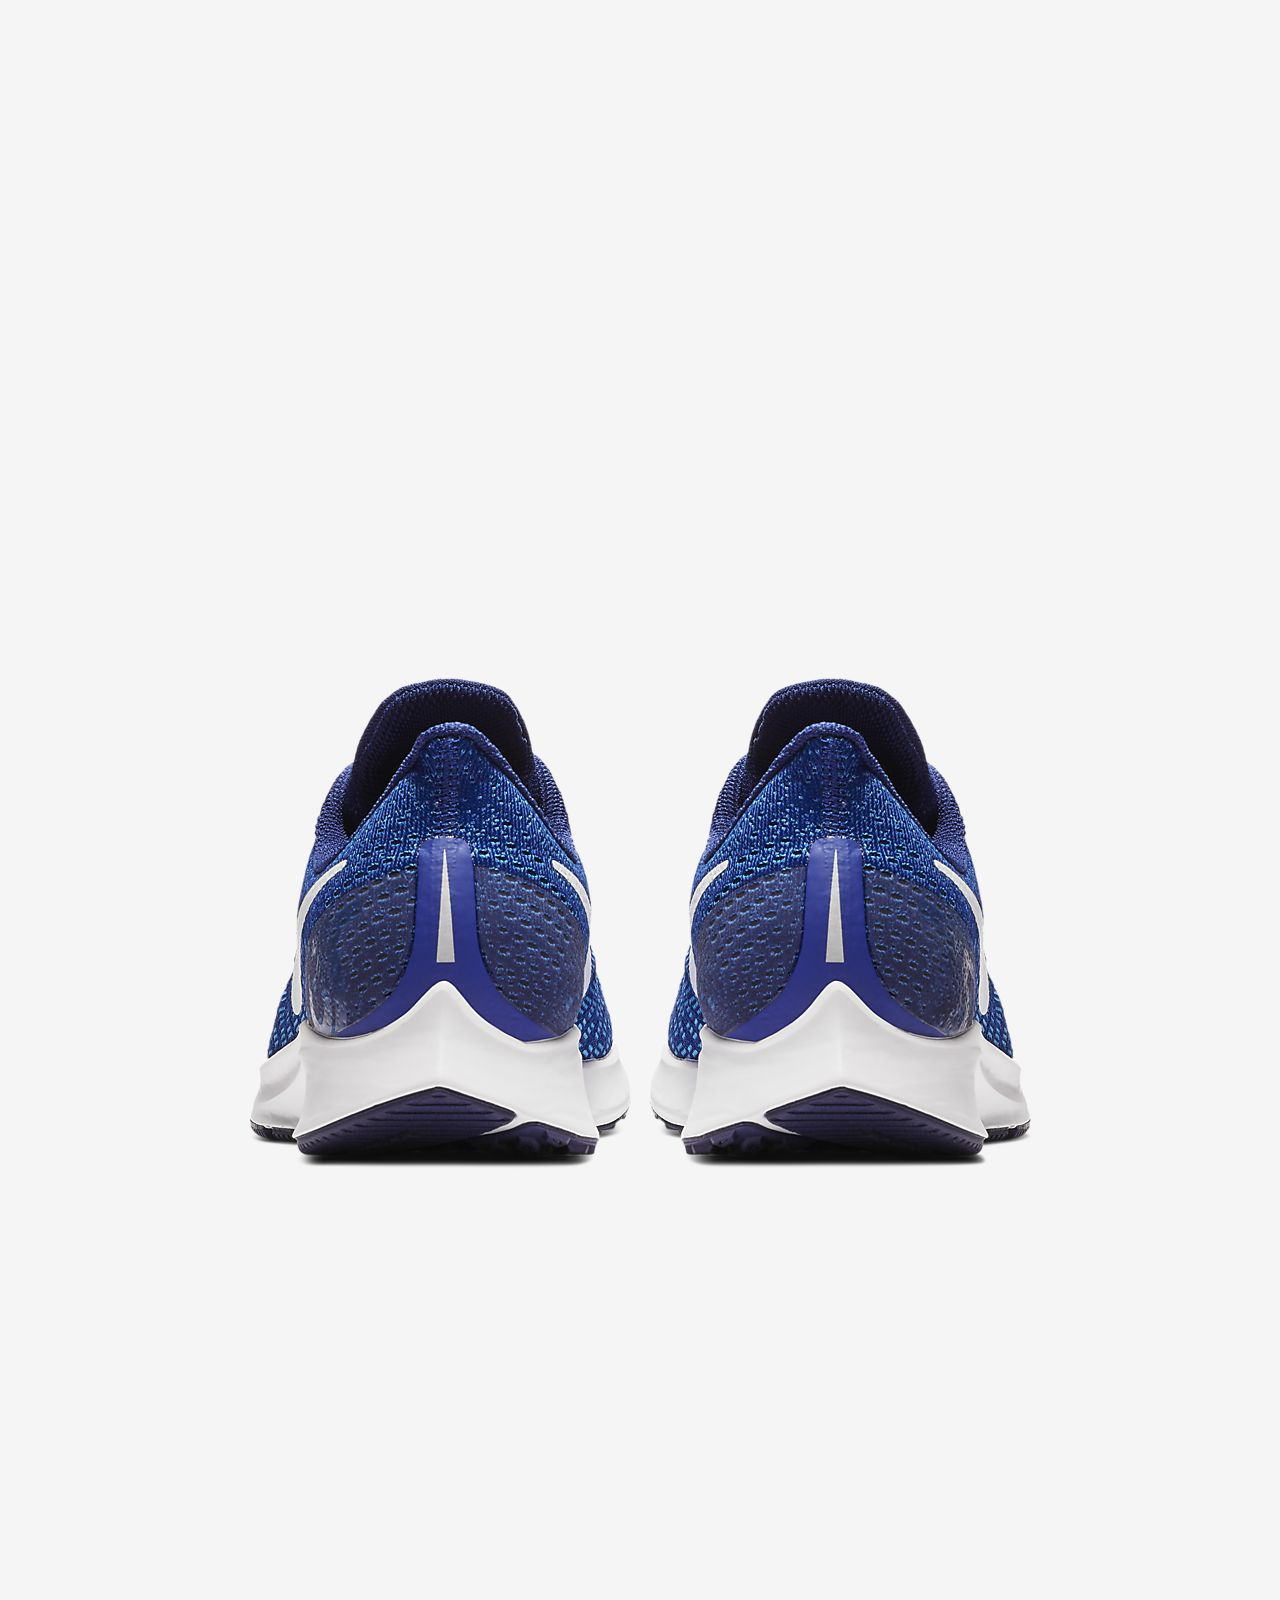 833b05a5f72 Nike Air Zoom Pegasus 35 Men s Running Shoe. Nike.com AU